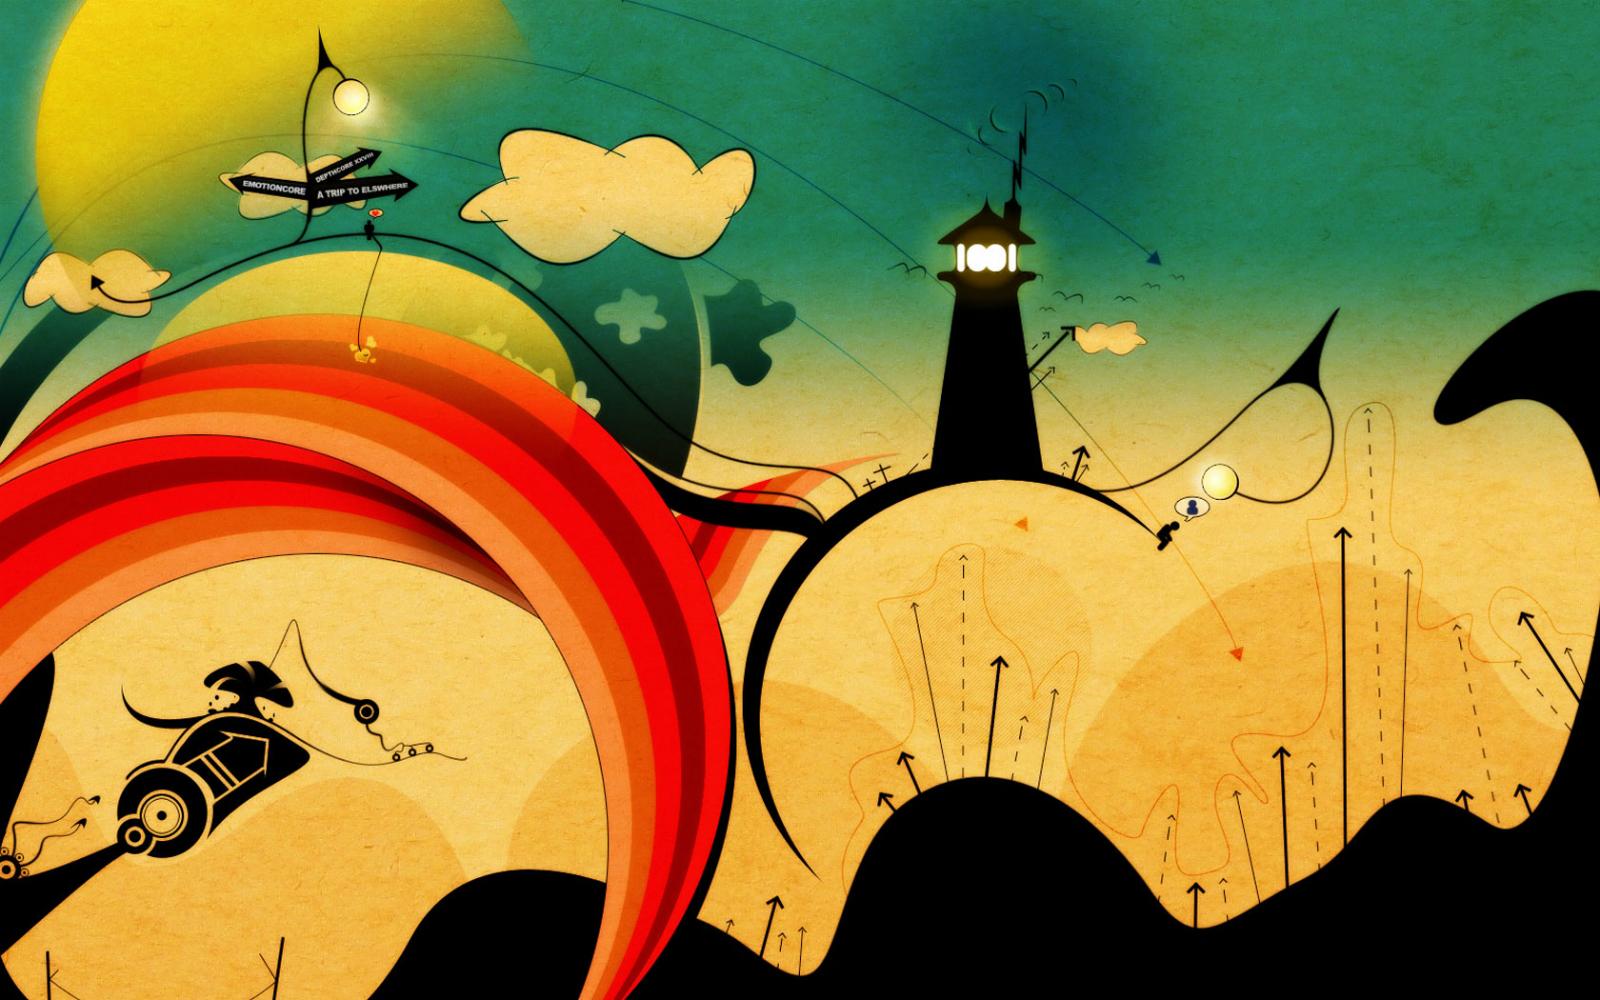 abstract art wallpaper cartoon - photo #22